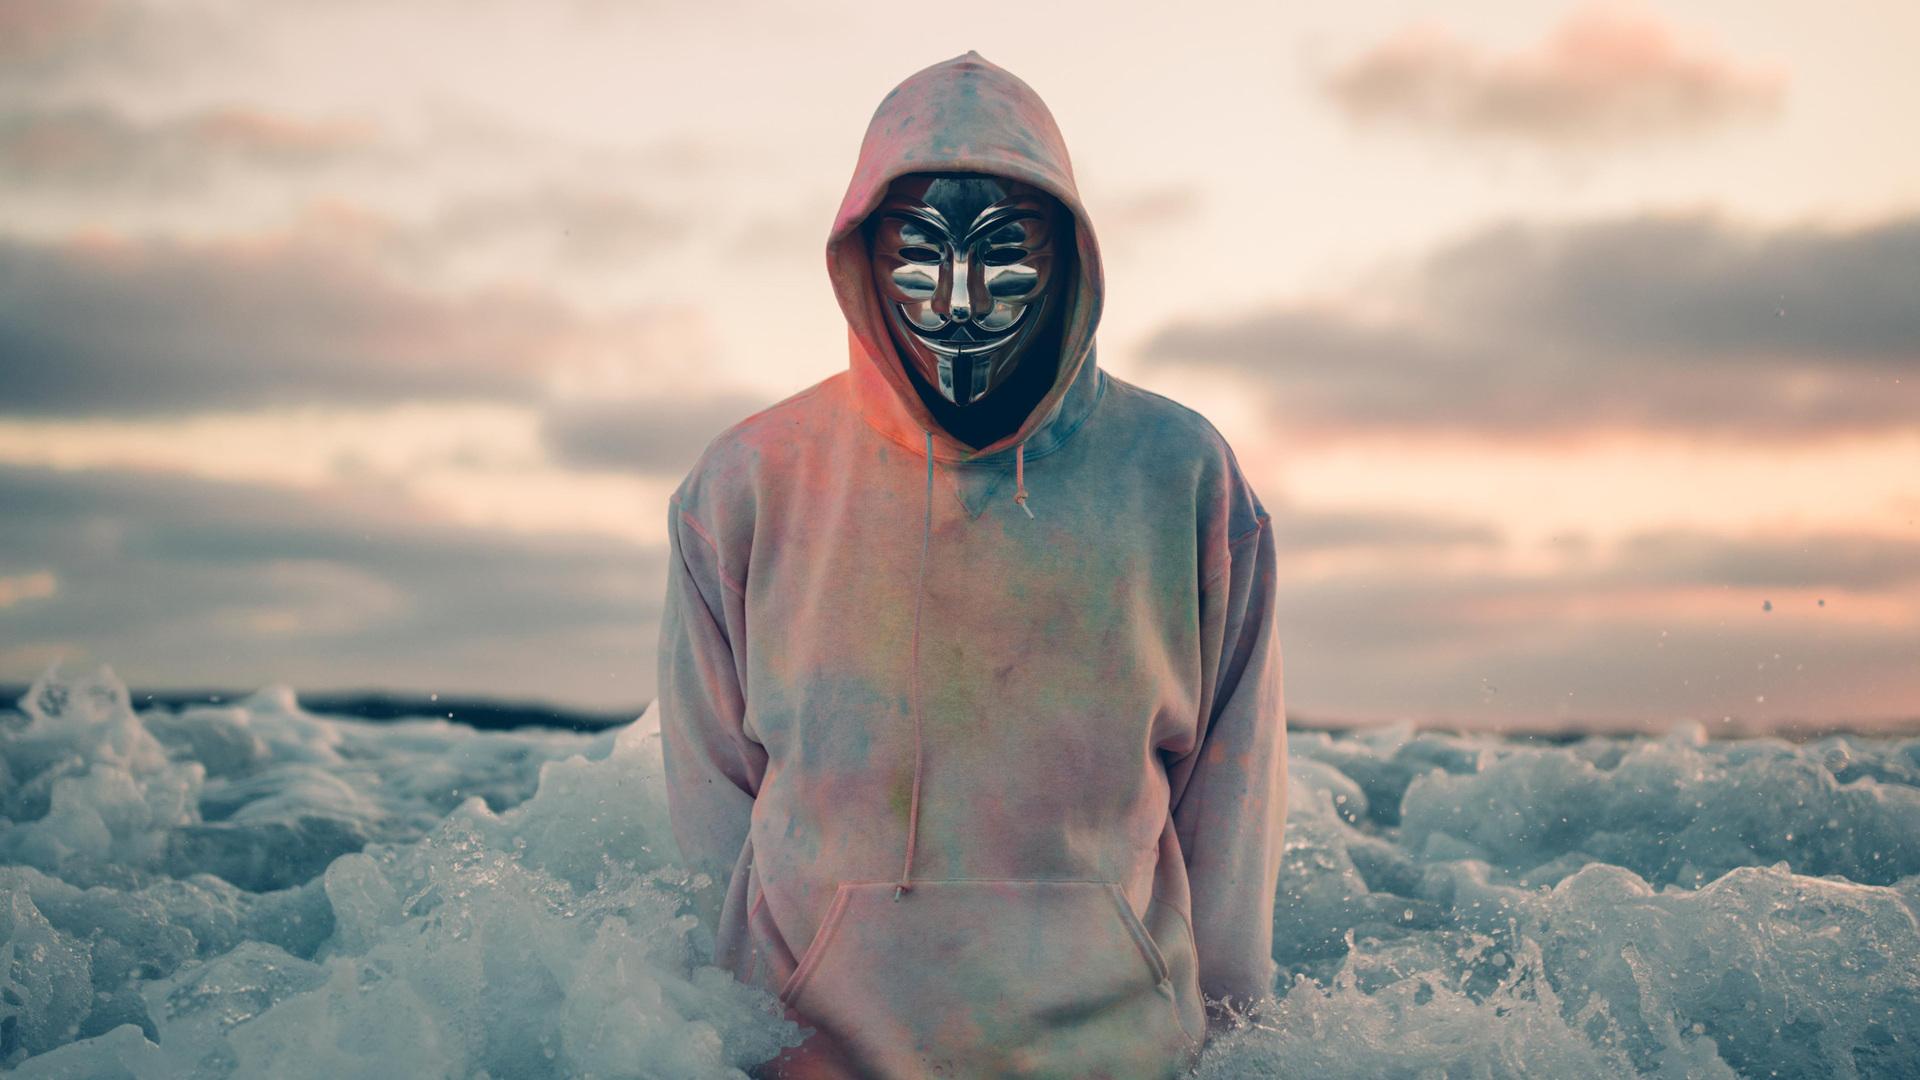 1920x1080 anonymous laptop full hd 1080p hd 4k wallpapers - Anonymous wallpaper full hd ...